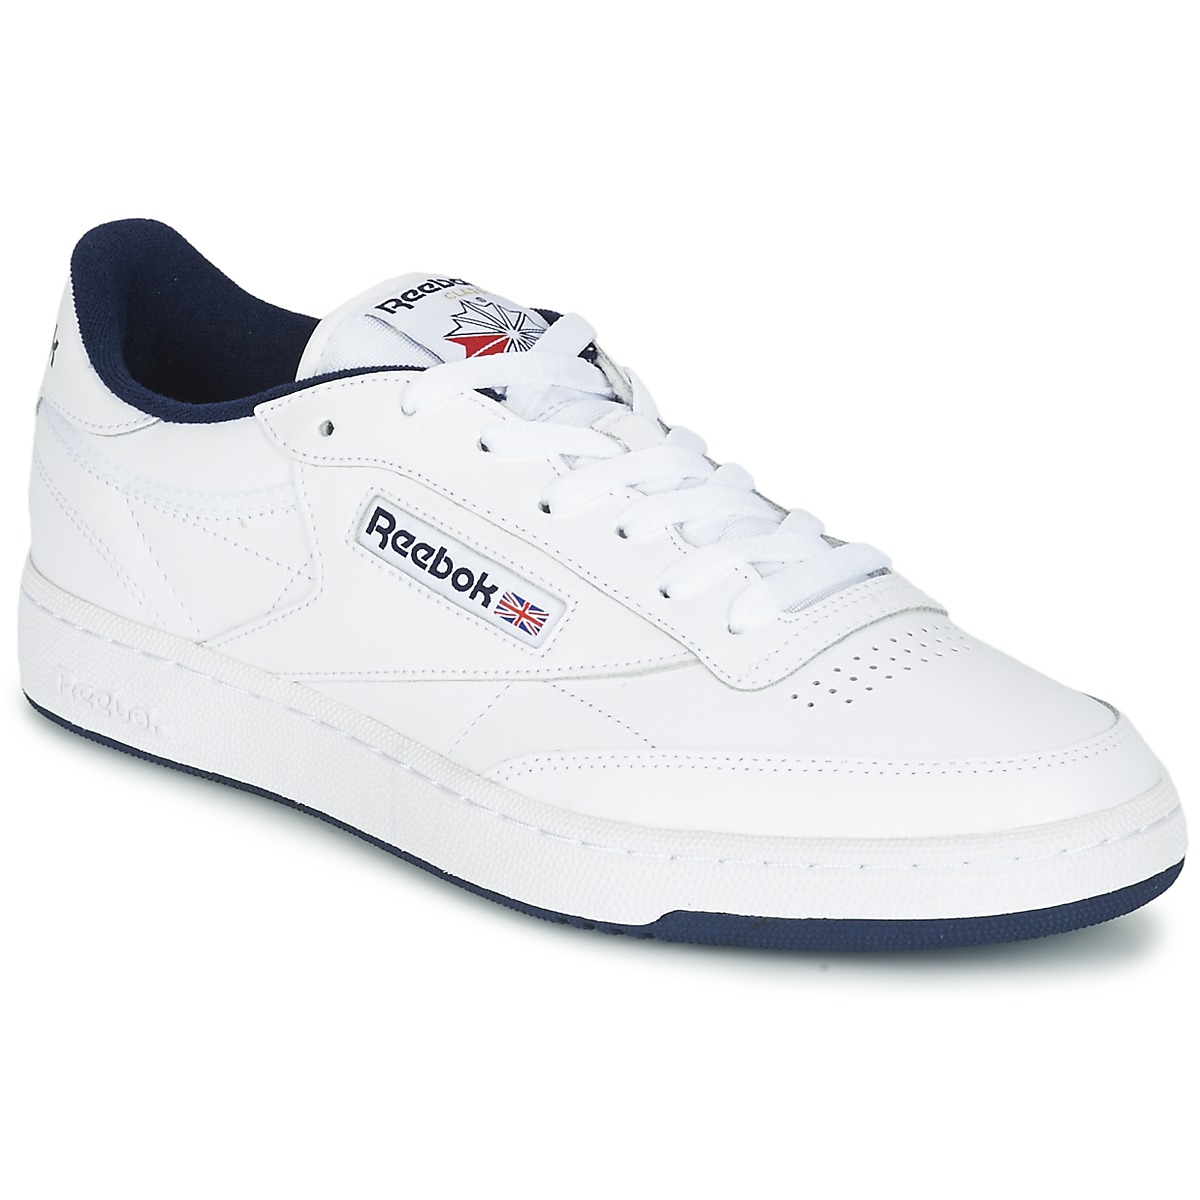 Reebok Classic CLUB C 85 White / Blue